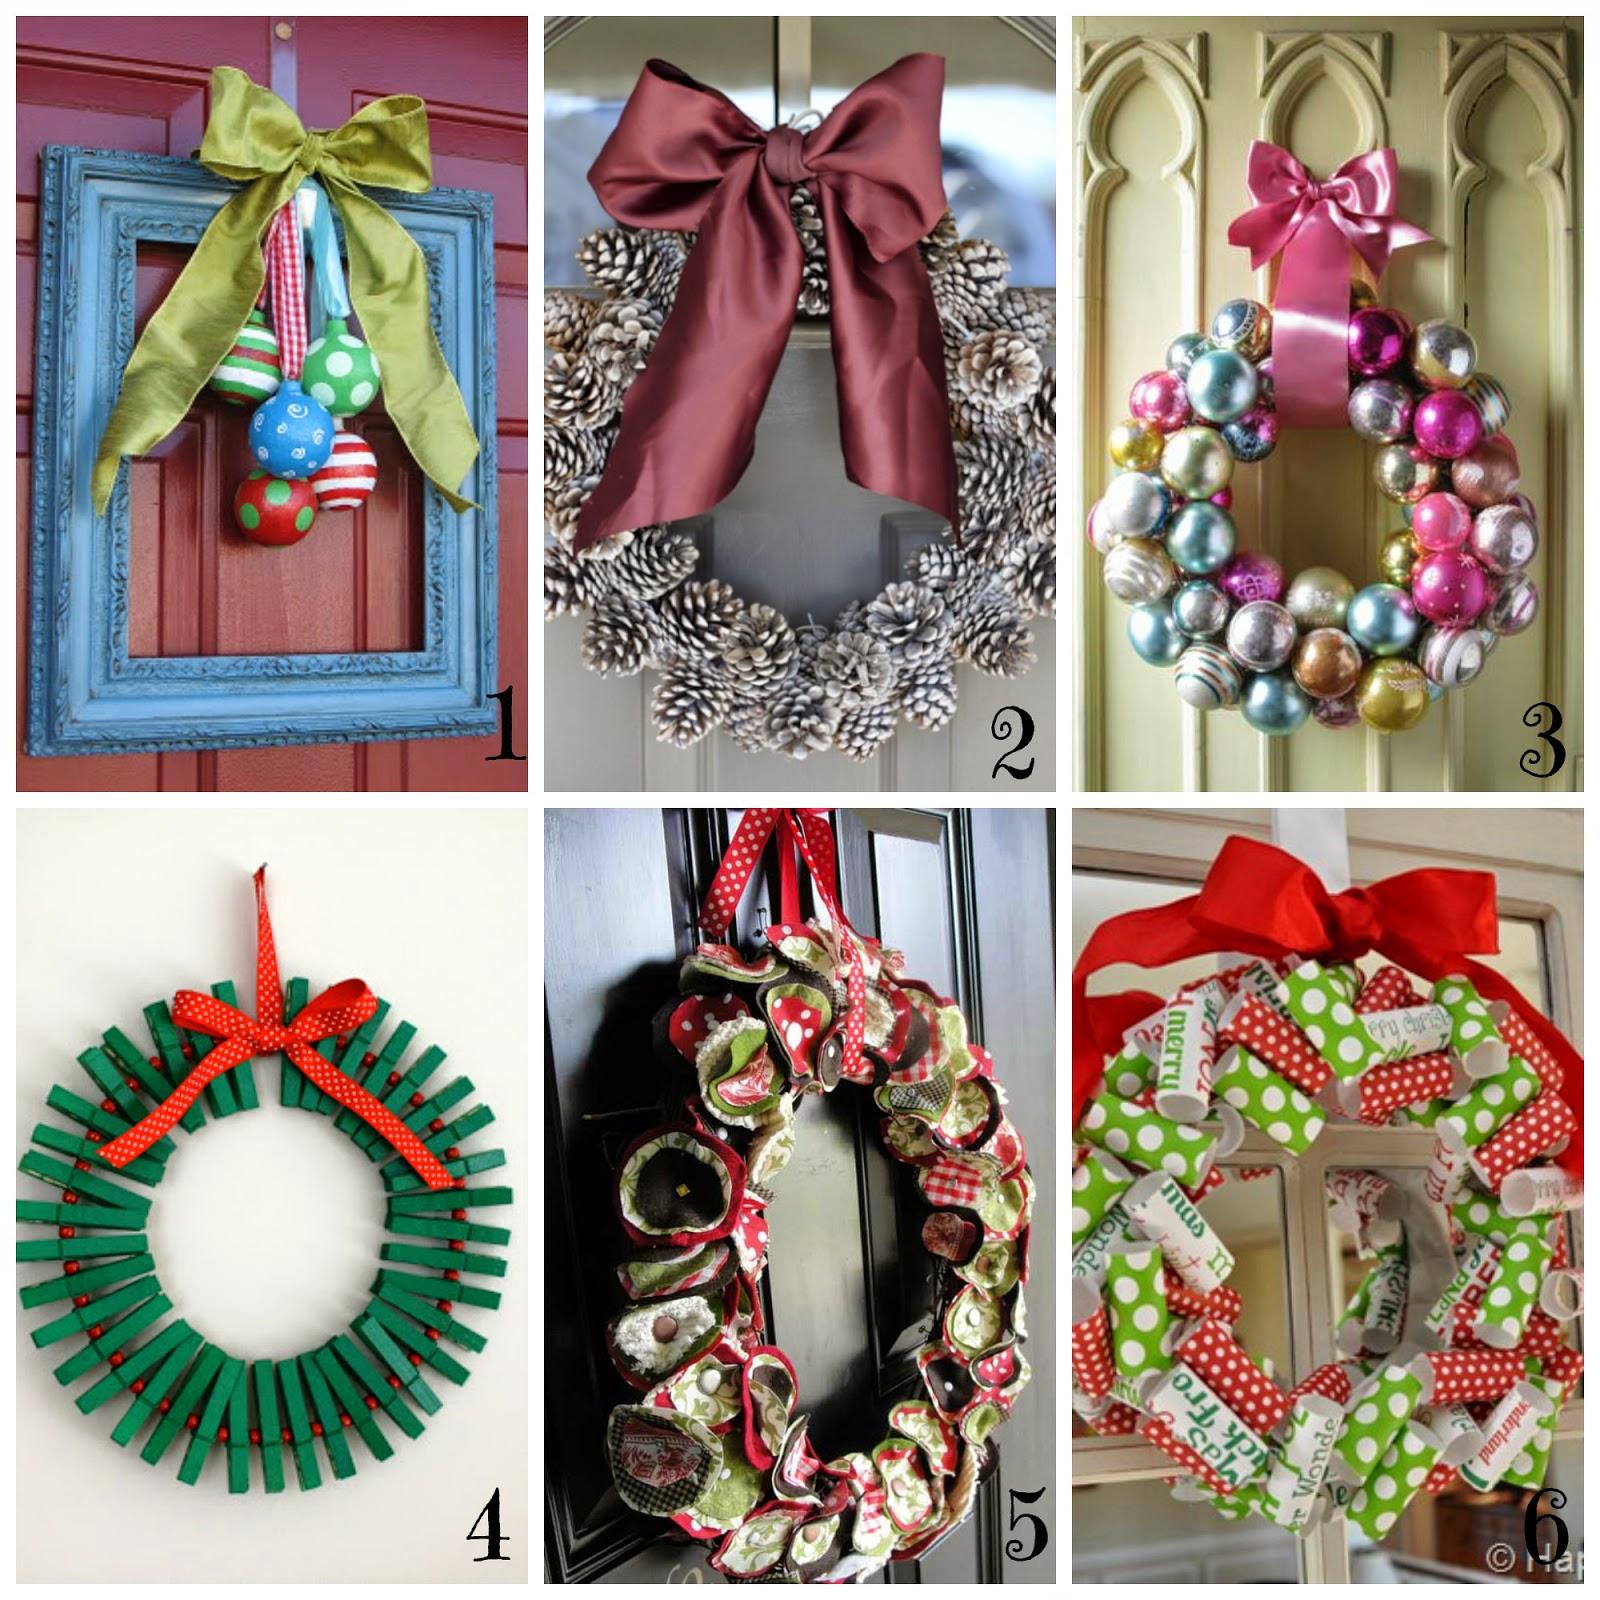 Ghirlande di natale fai da te 12 tutorial semplici e veloci - Decorazioni natalizie fatte a mano per bambini ...